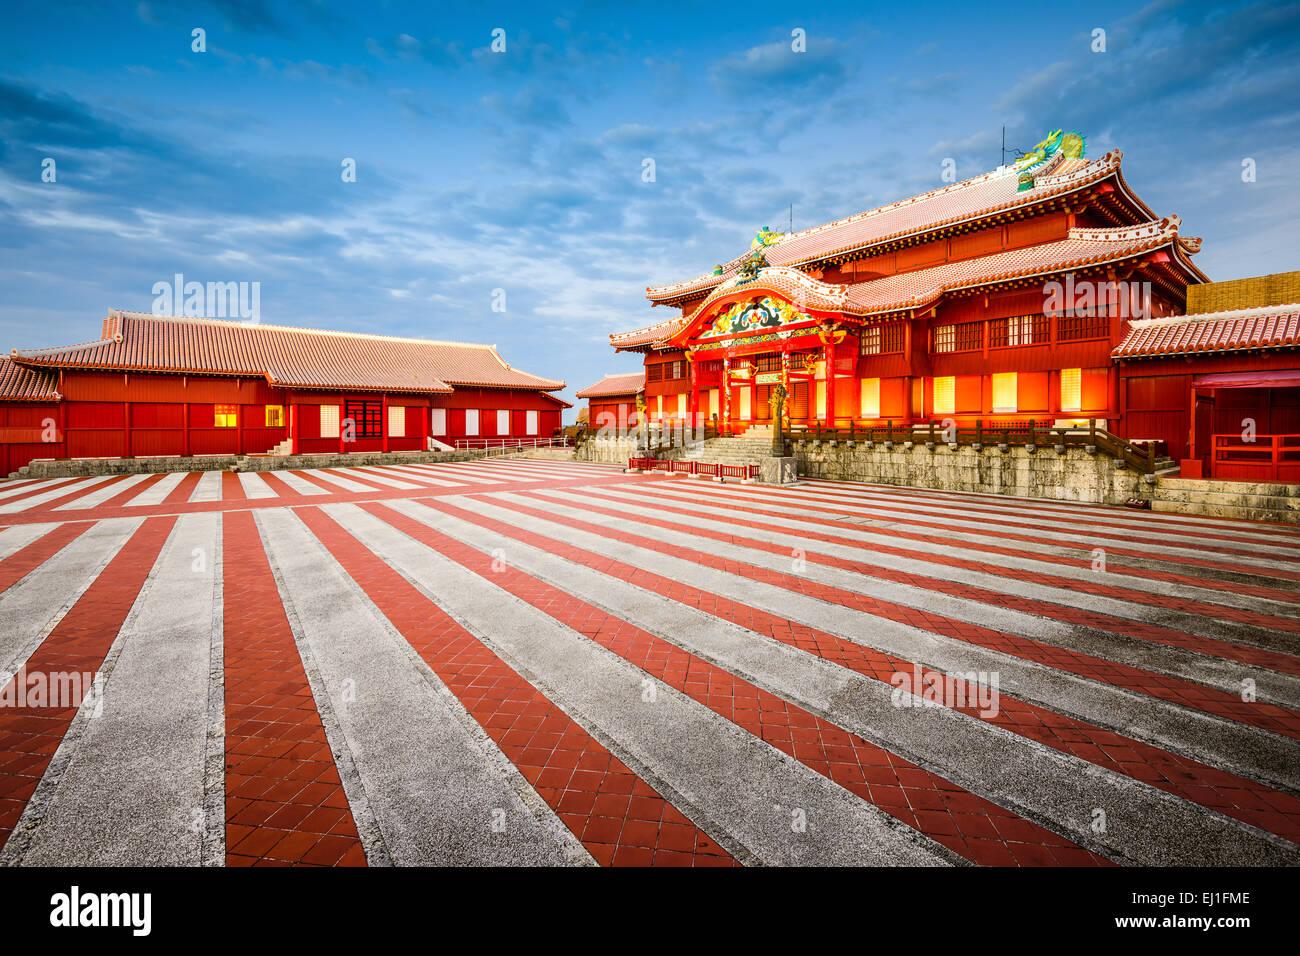 Okinawa, Japan at  historic Shuri Castle. - Stock Image